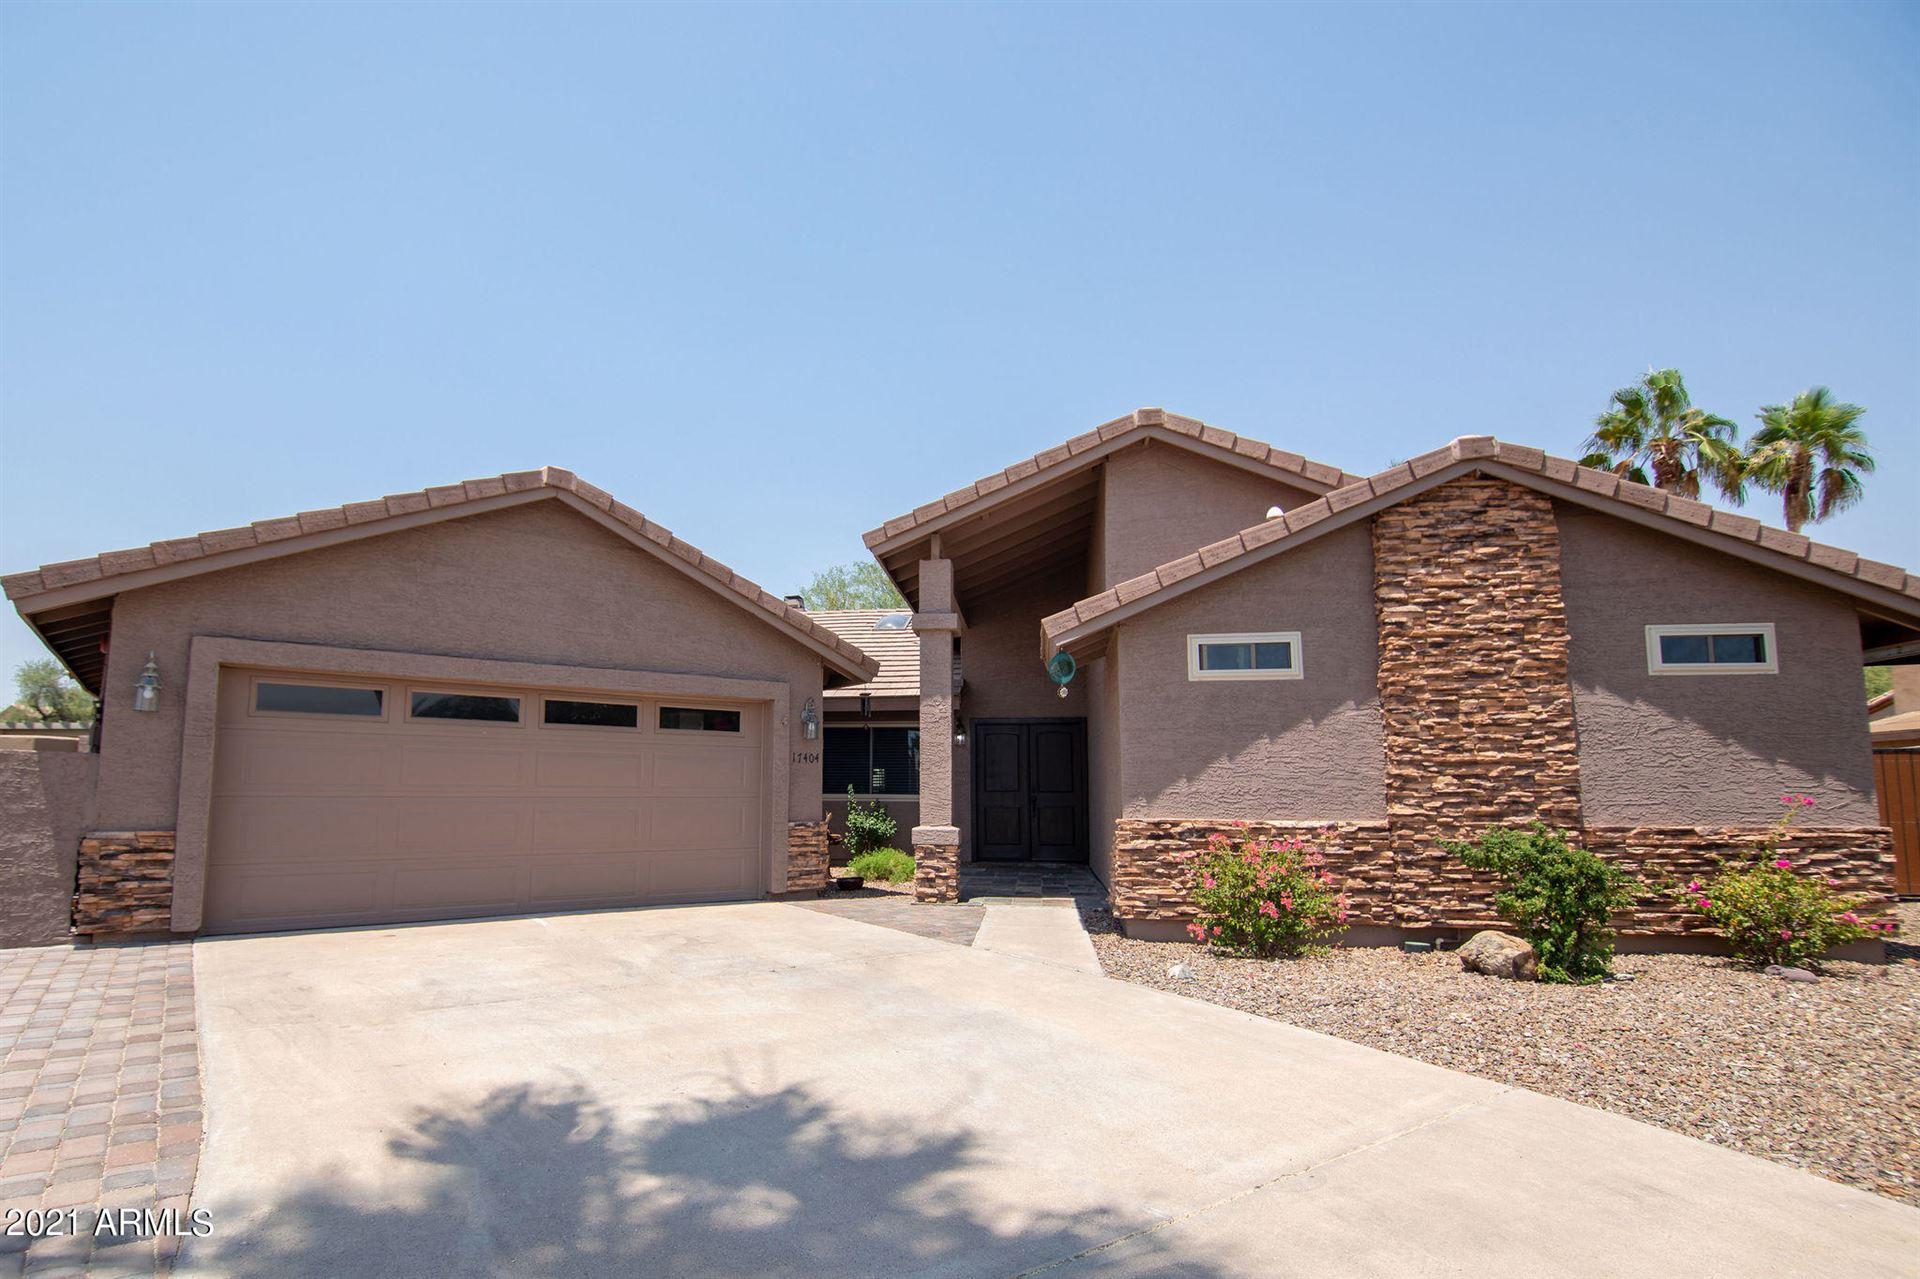 17404 E SANTA ROSA Lane, Fountain Hills, AZ 85268 - MLS#: 6240112